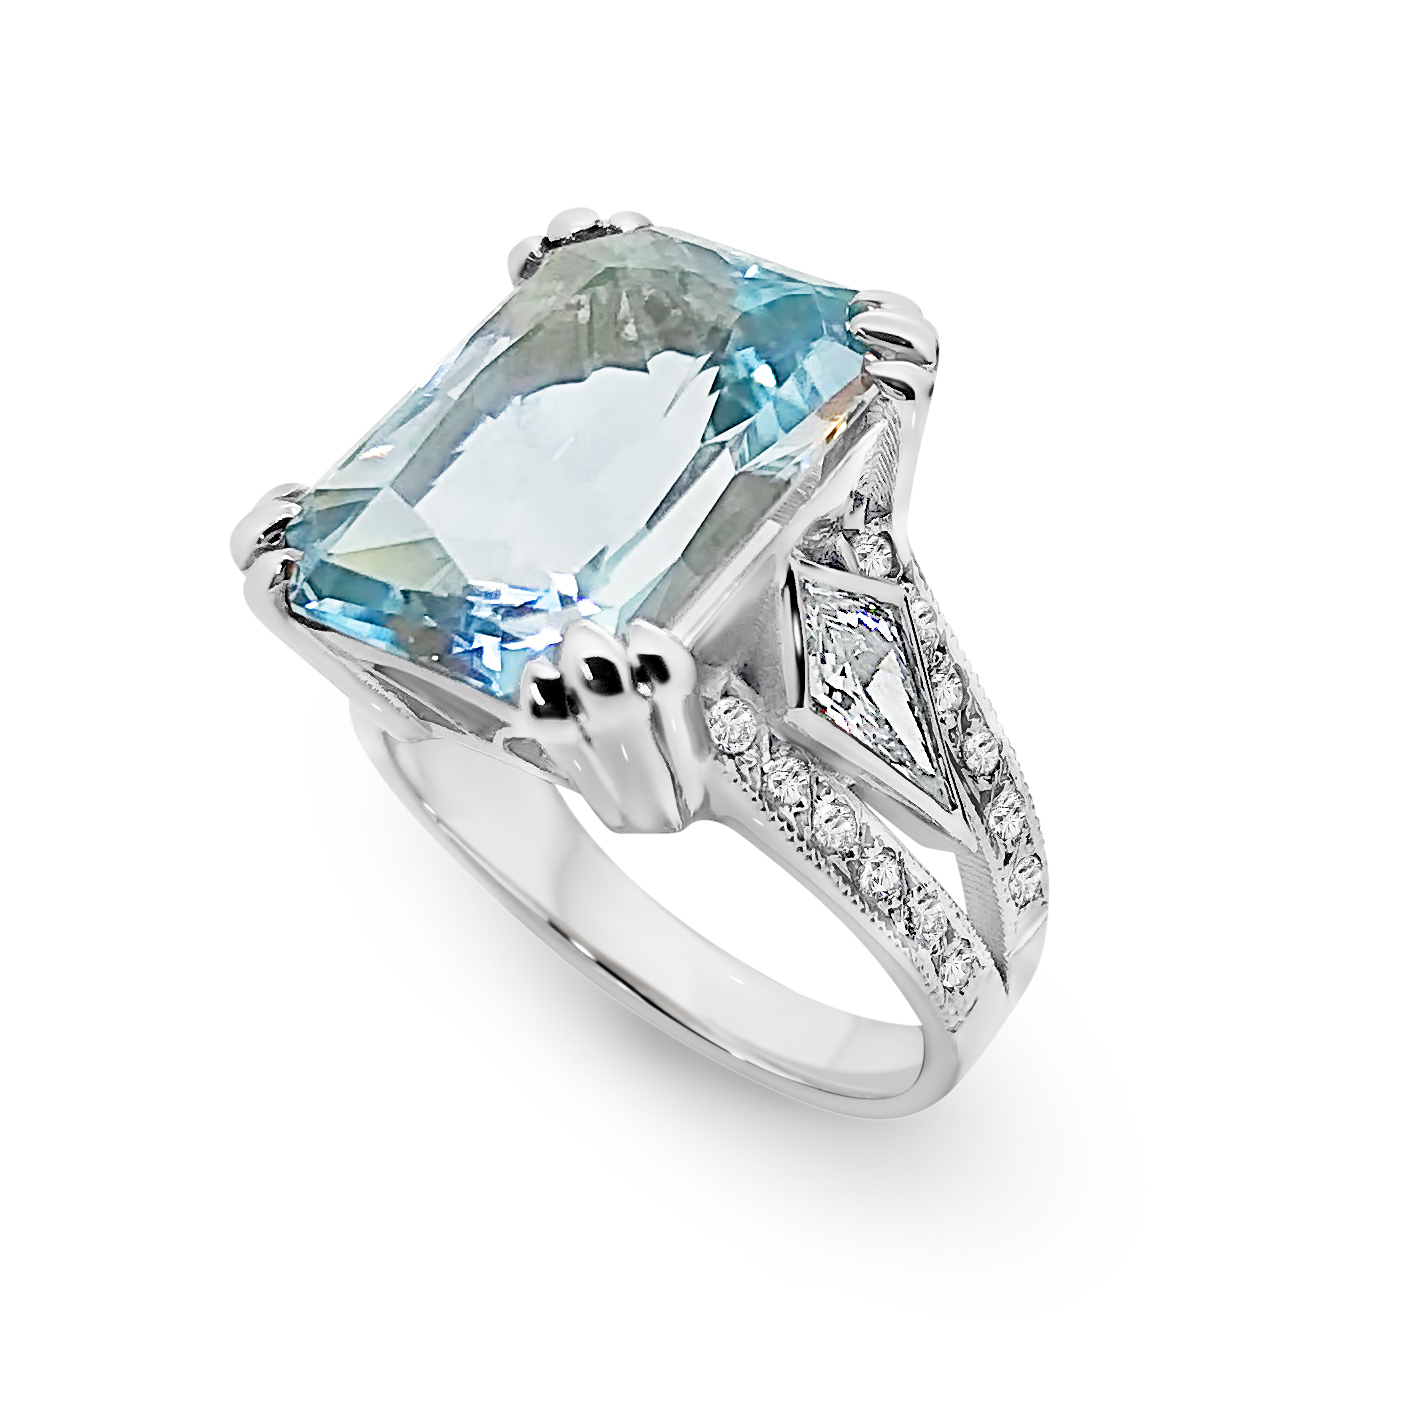 Bespoke Topaz & Kite Diamond Ring